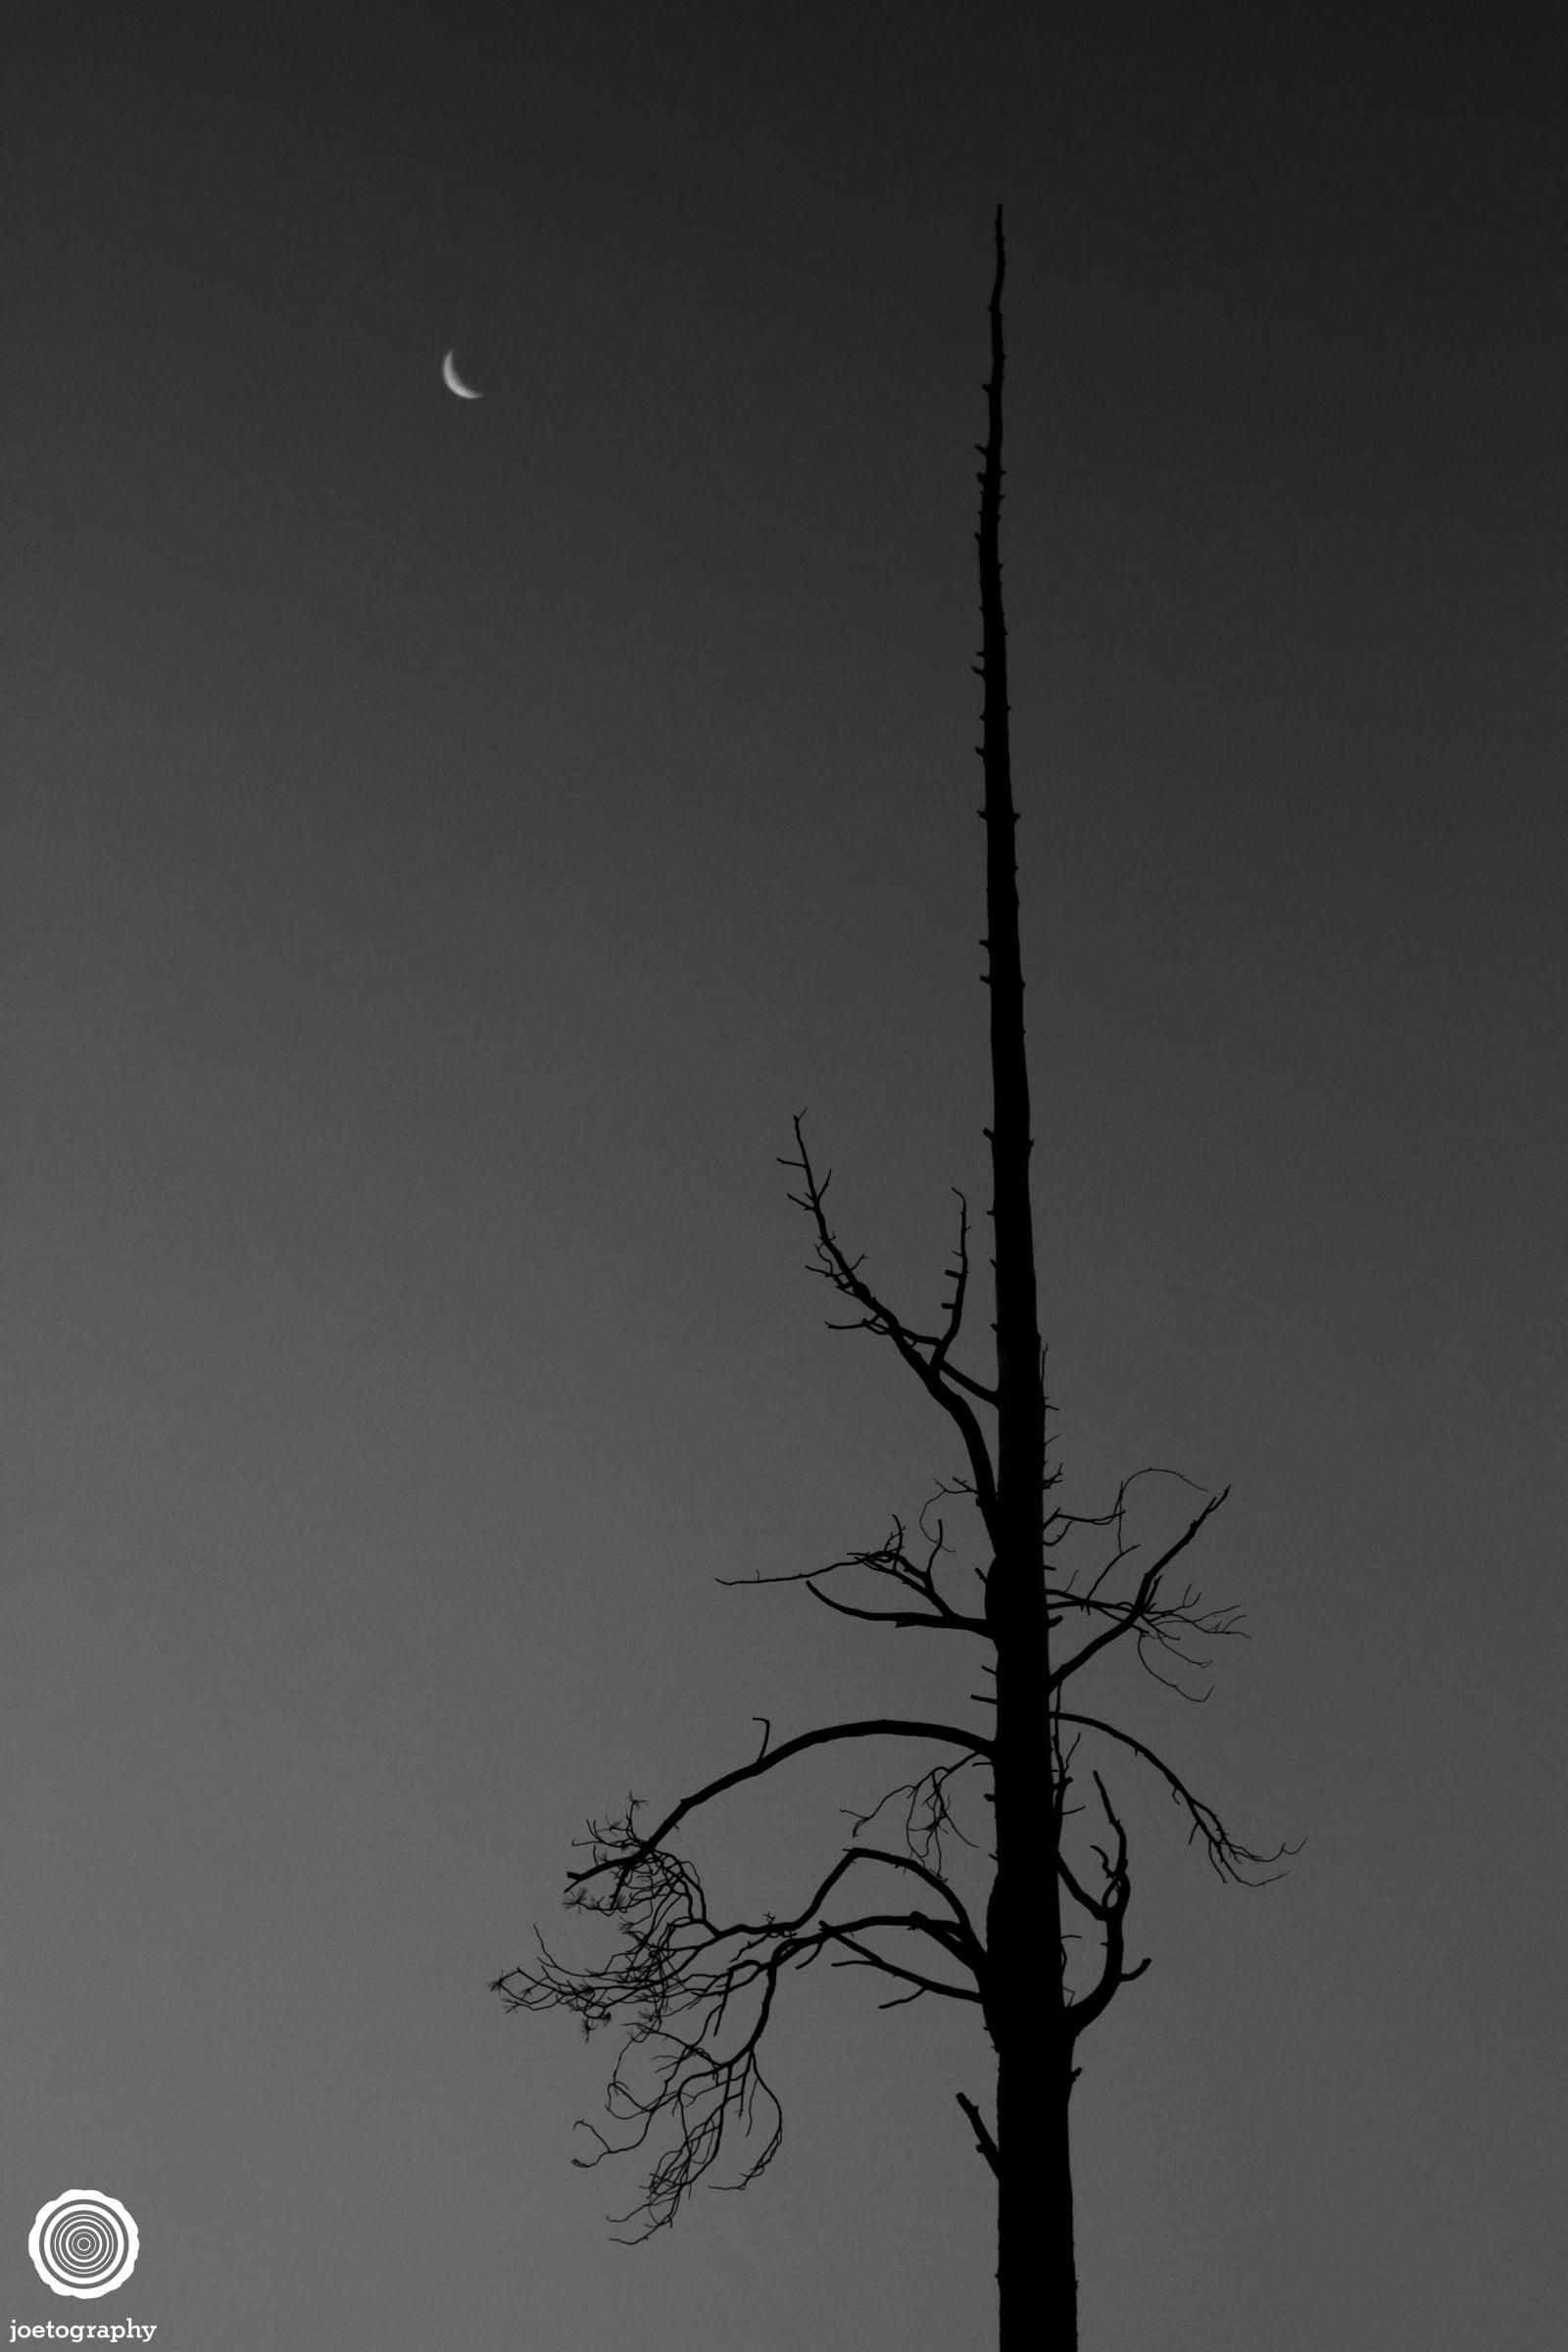 joetography-travel-photography-yosemite-2015-31